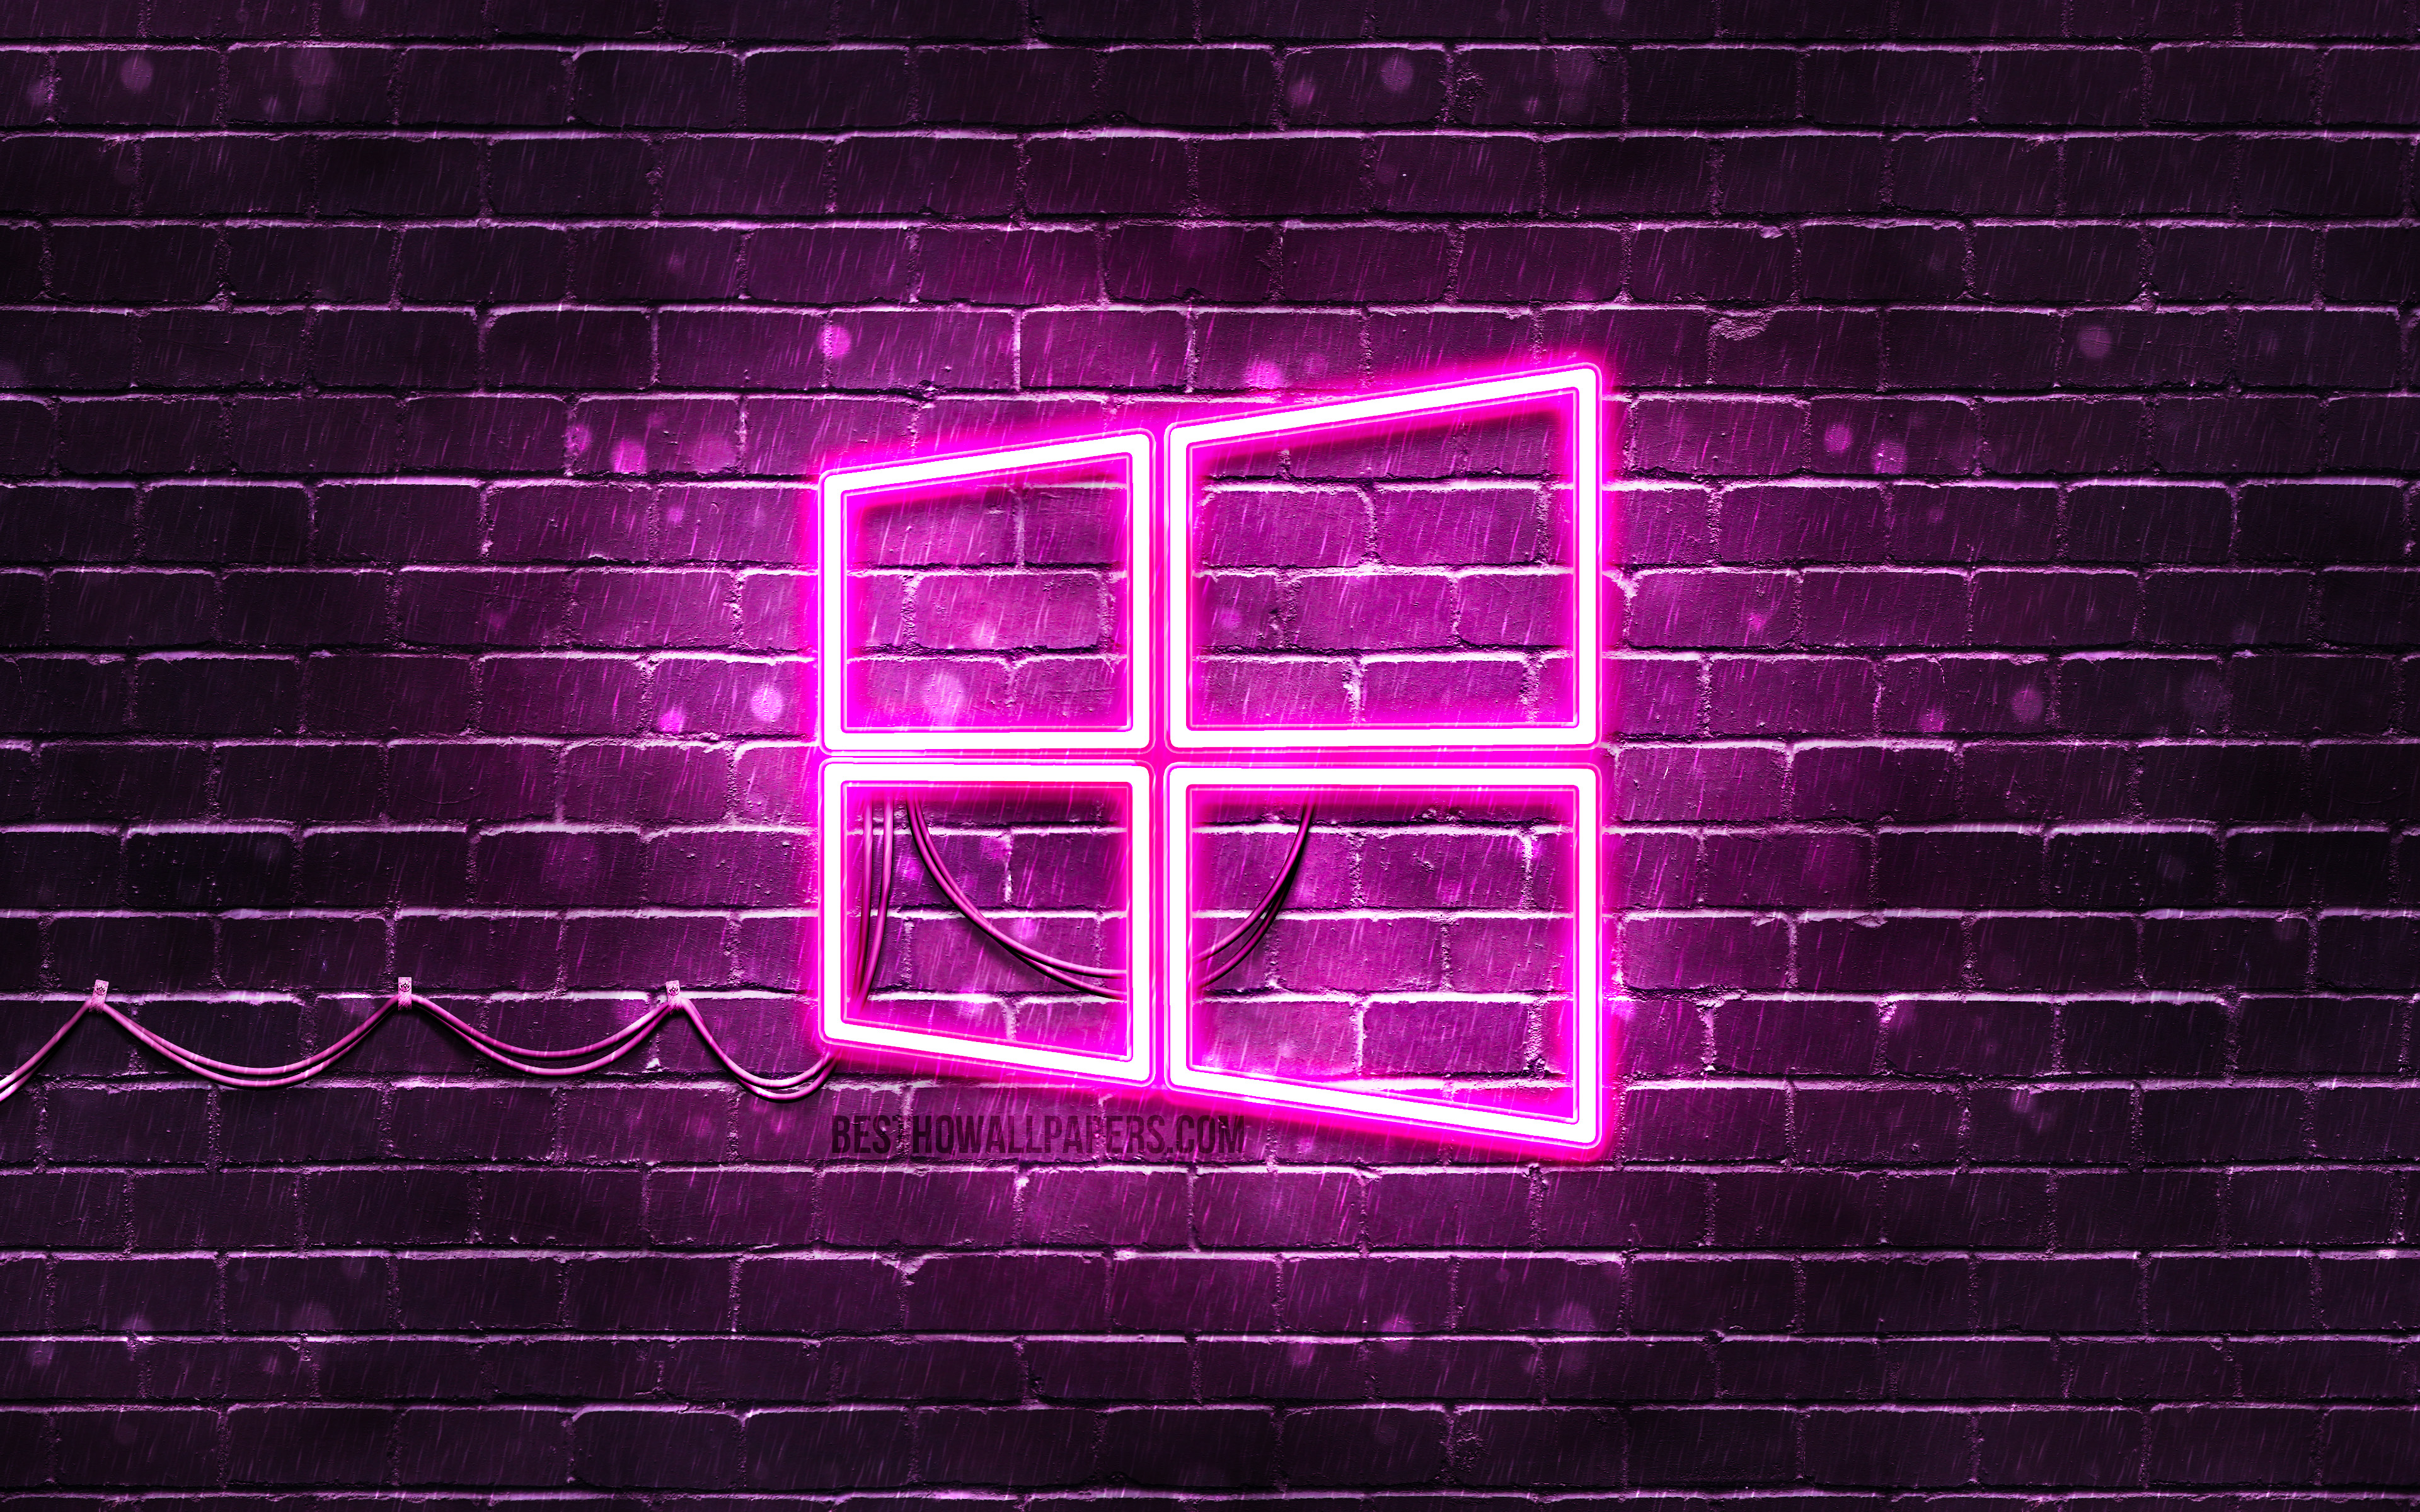 Windows 10 Purple Logo 4k Purple Brickwall Windows Martin Garrix Wallpaper 4k 3840x2400 Wallpaper Teahub Io